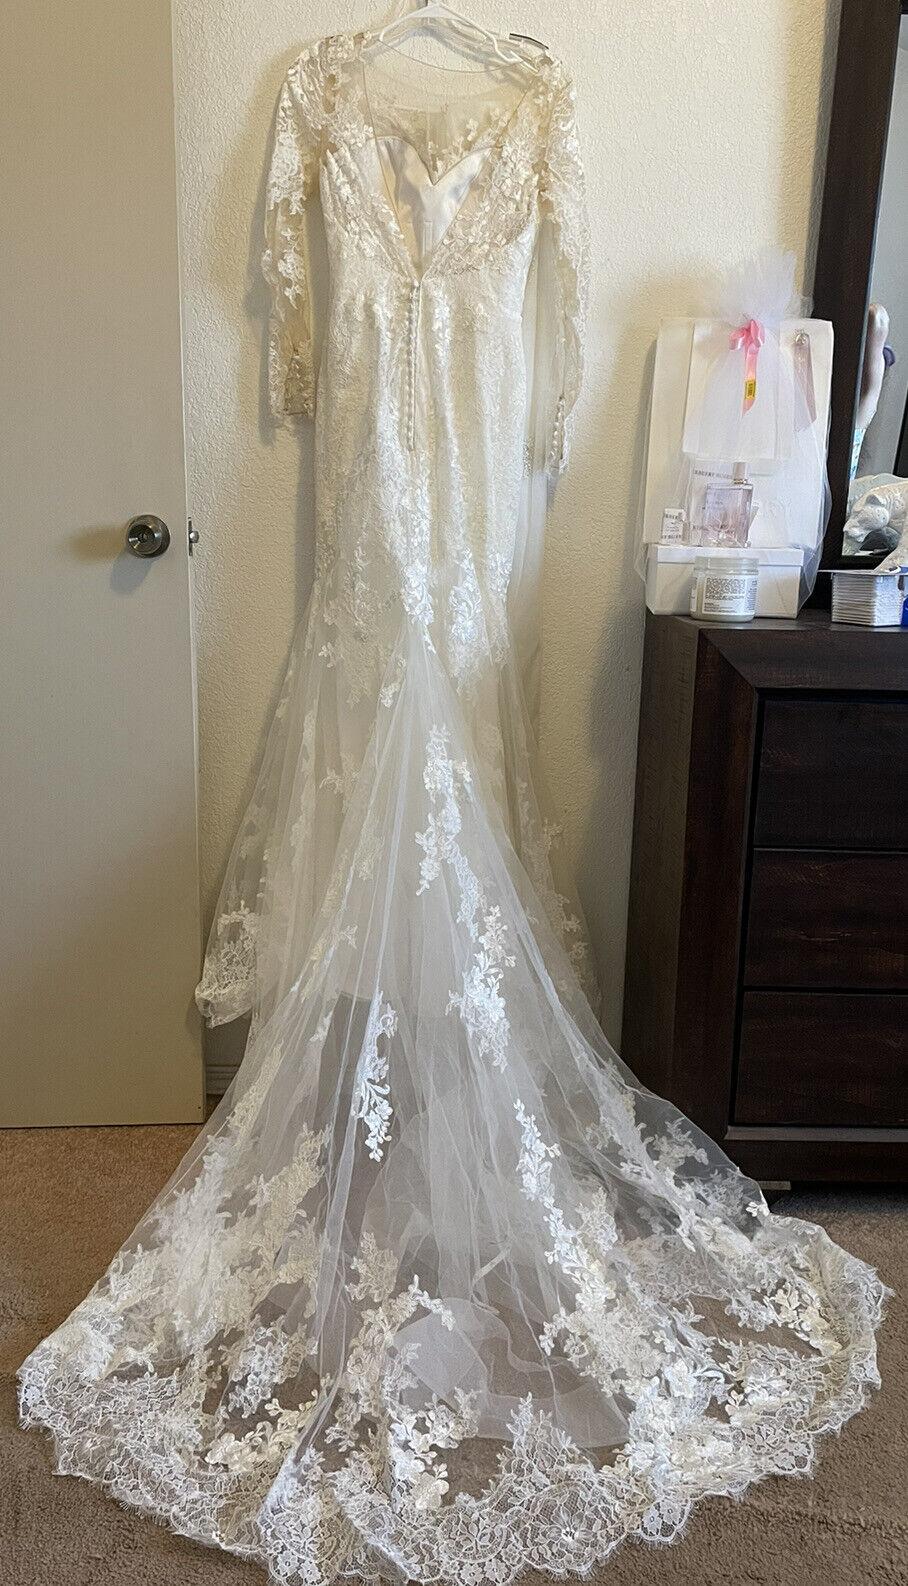 *New* Bridal Novias White Wedding Dress